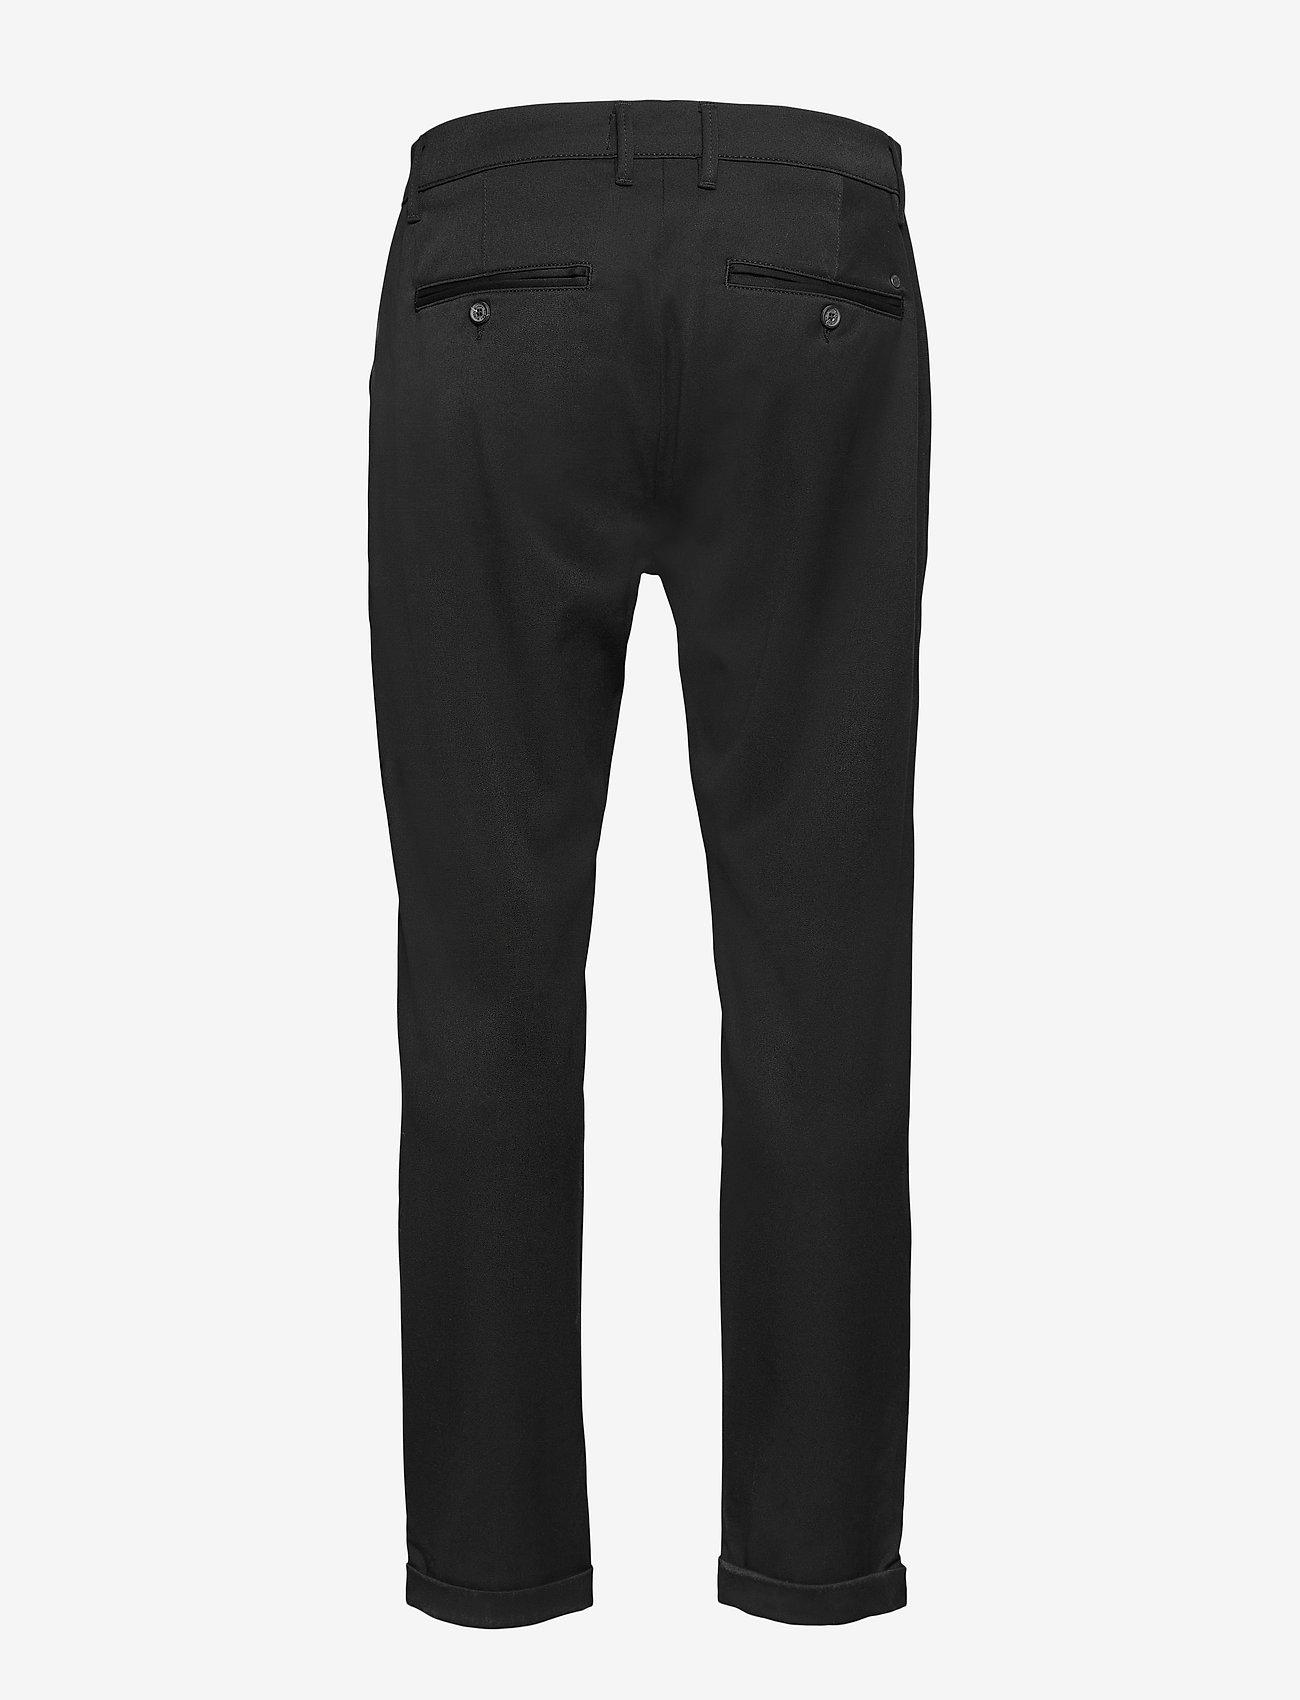 Gabba - Rome Pants KD3950 - suitbukser - black - 1